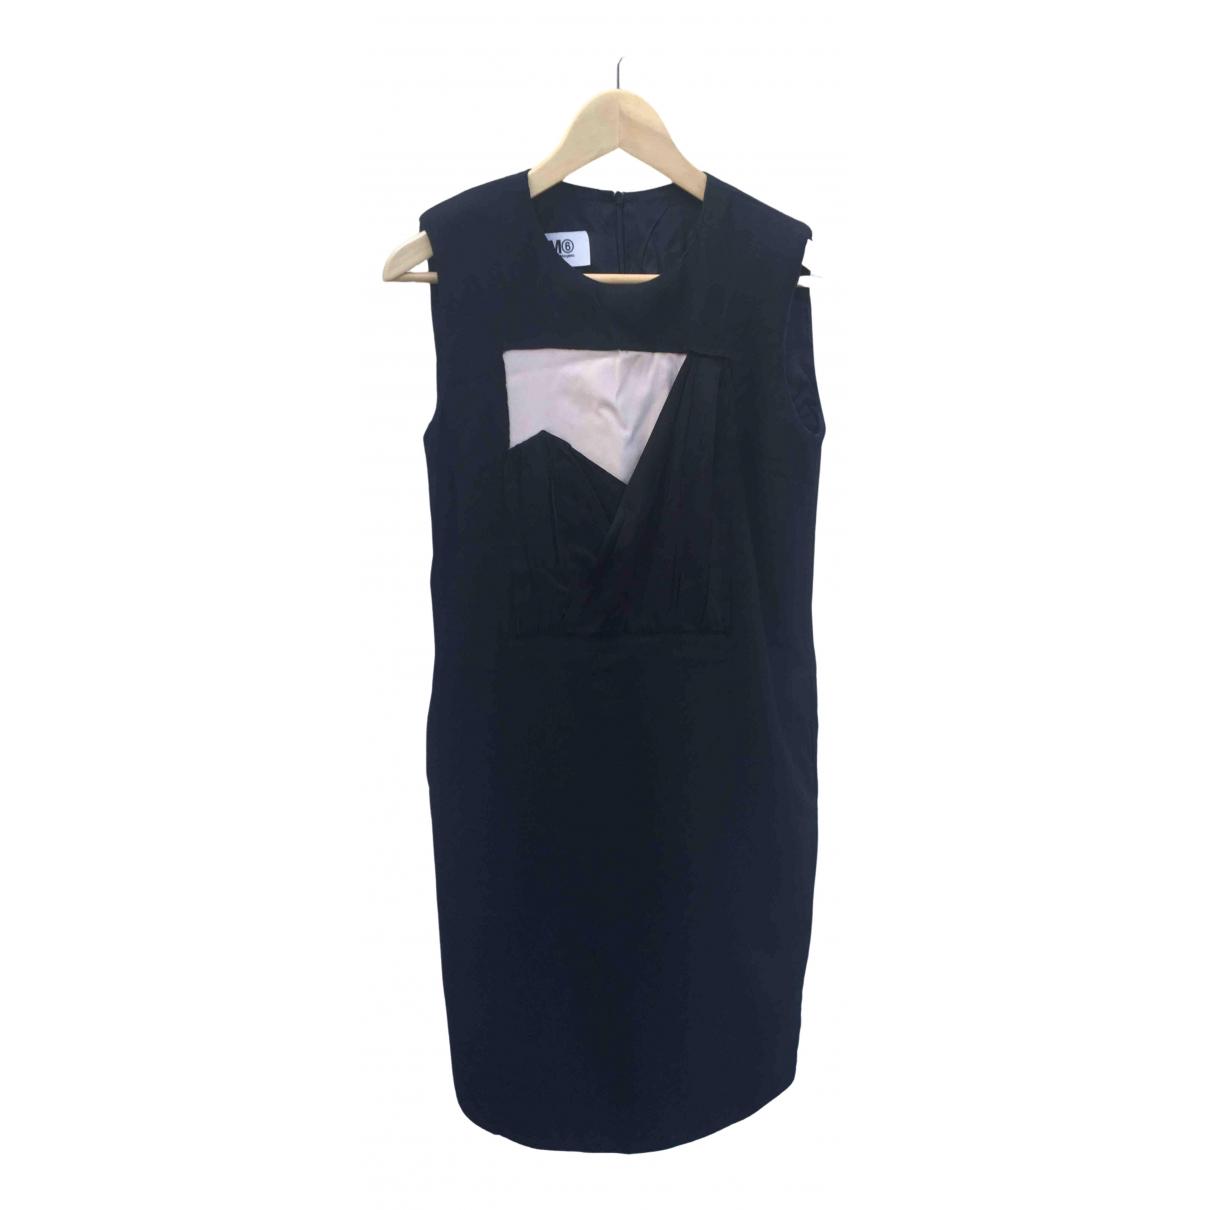 Mm6 \N Black Wool dress for Women 36 FR